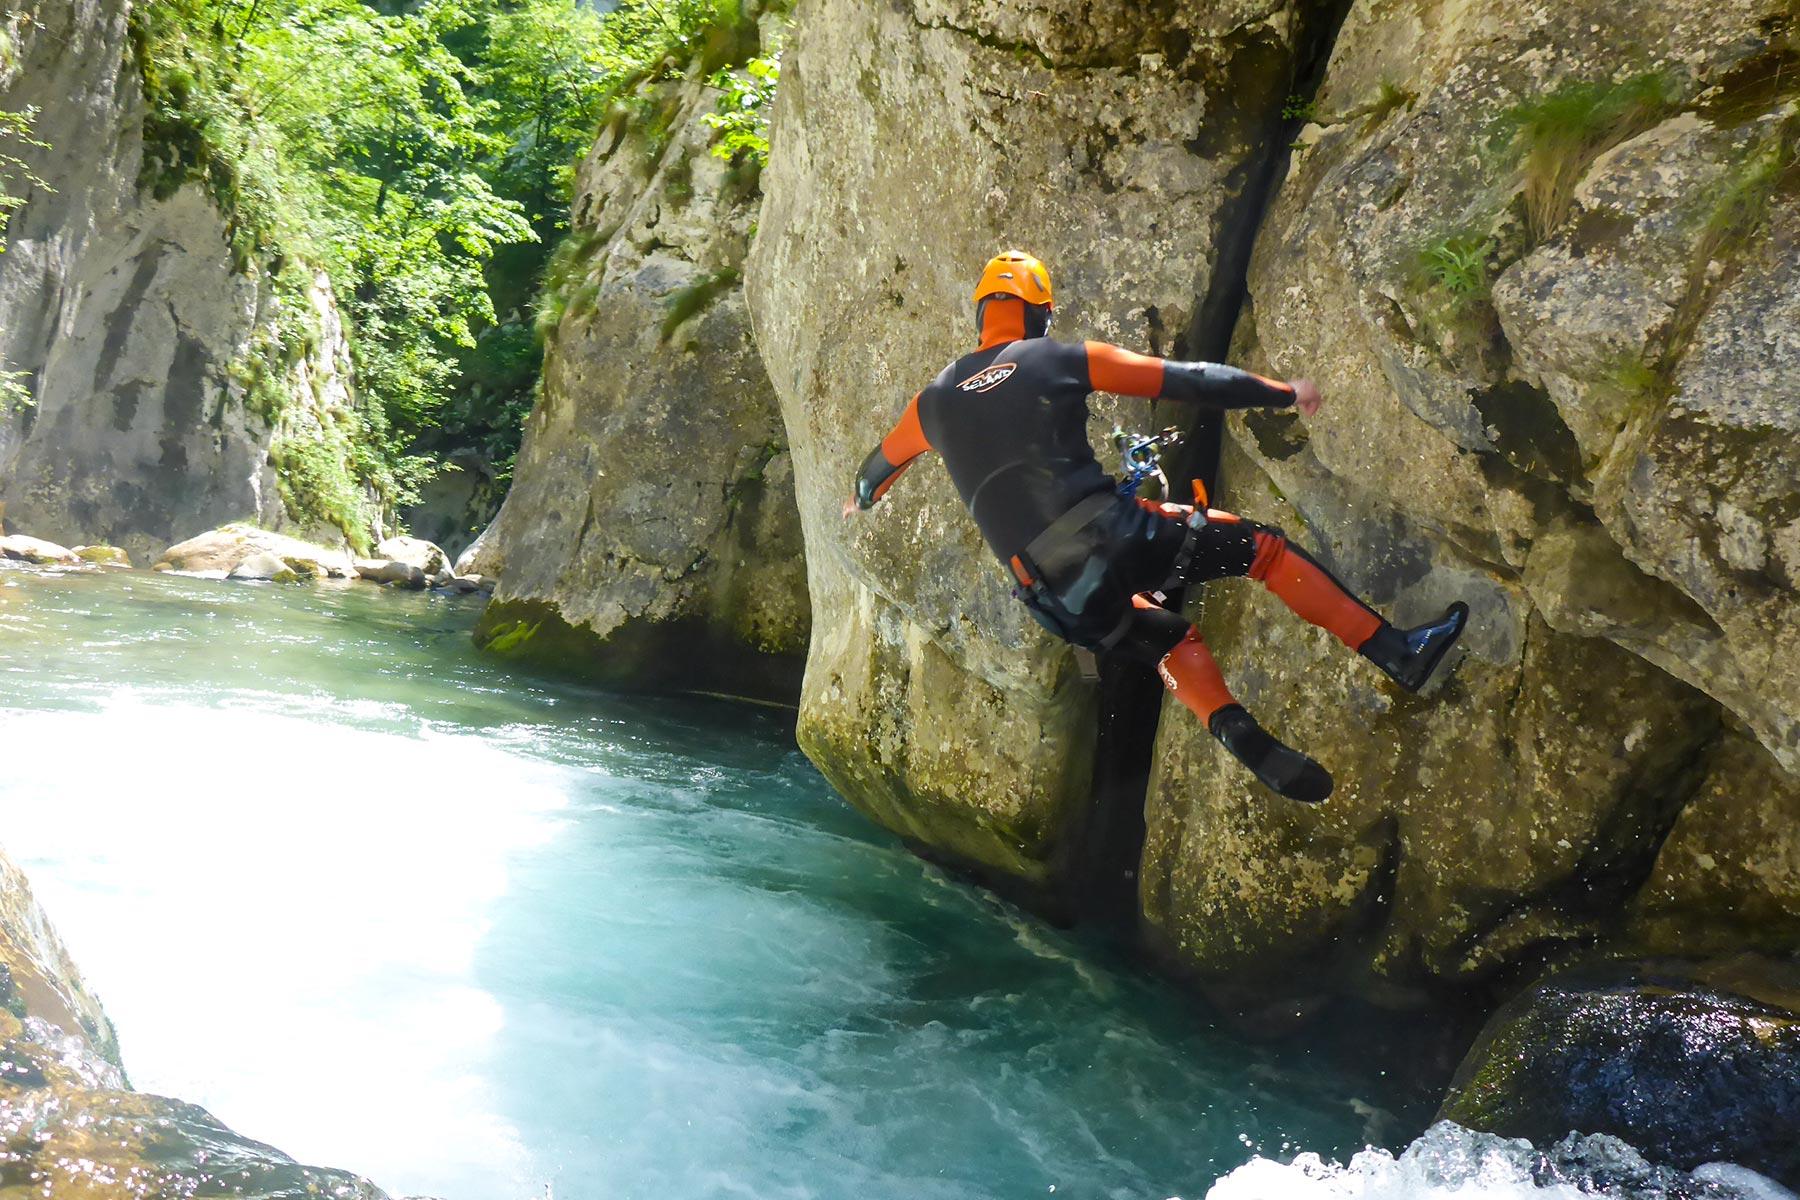 kanjoning hrcavka sutjeska nacionalni park